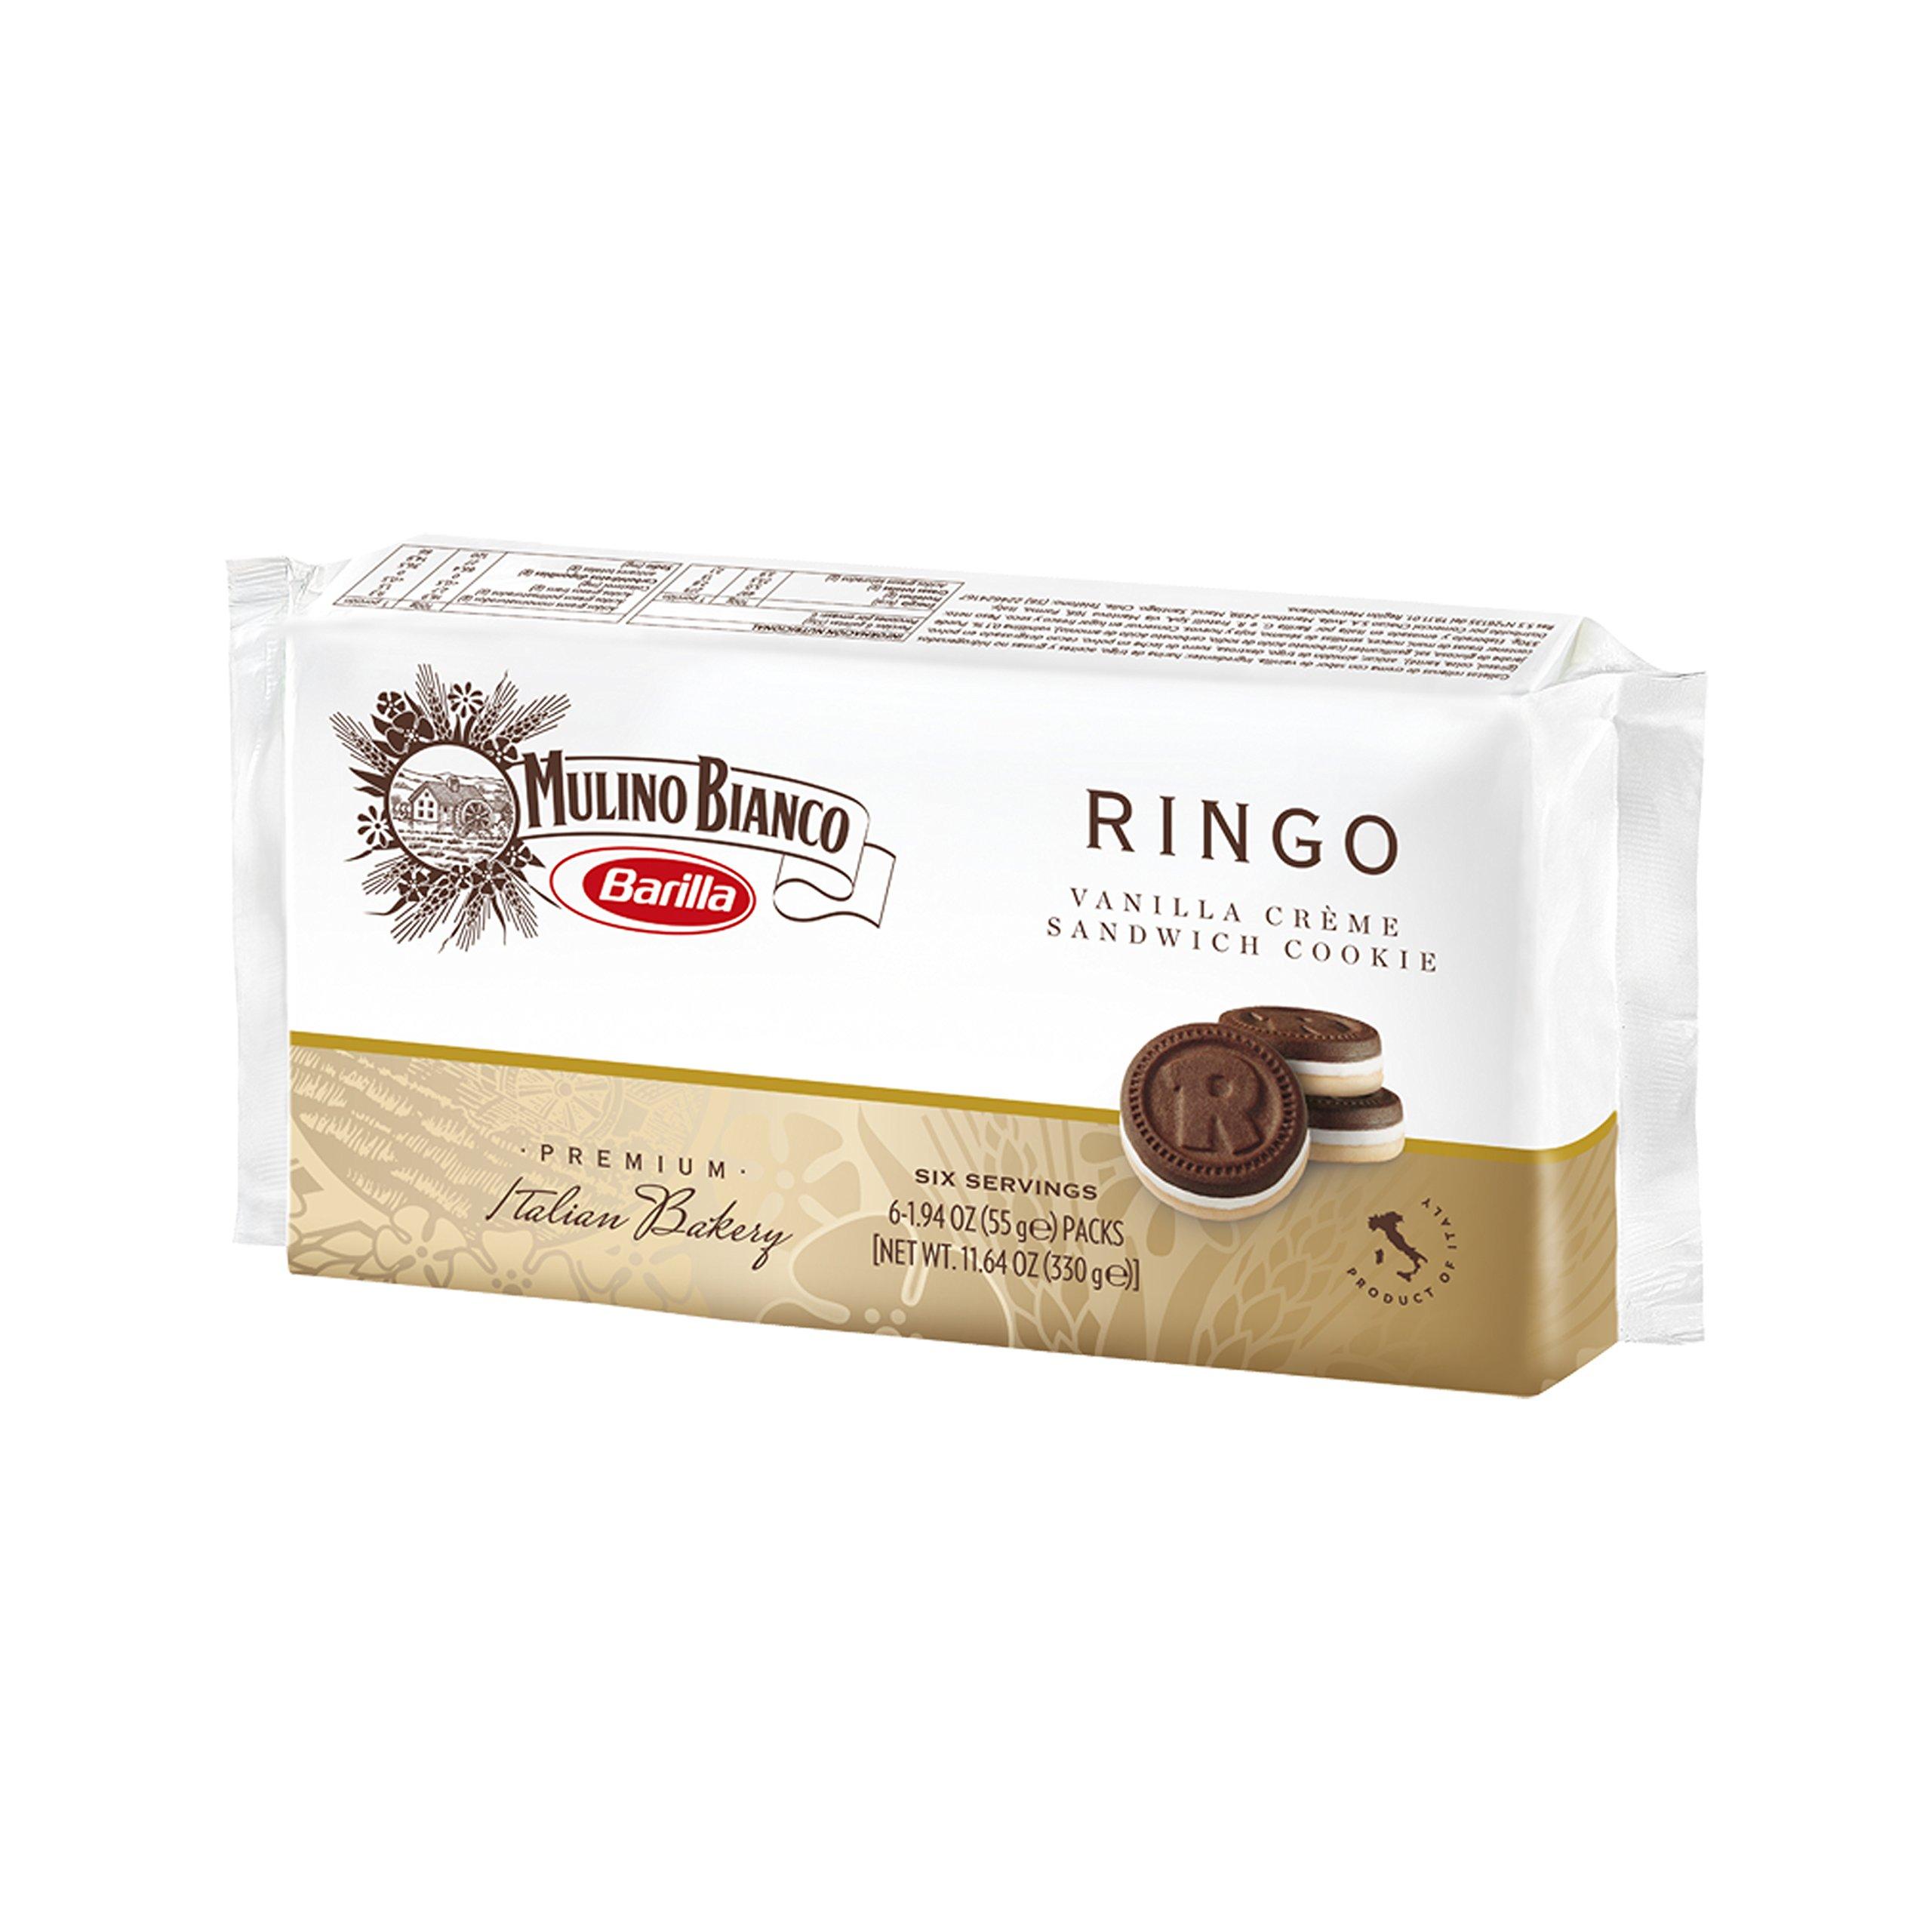 Mulino Bianco Ringo Cookie 11 6 Ounce Amazon Grocery